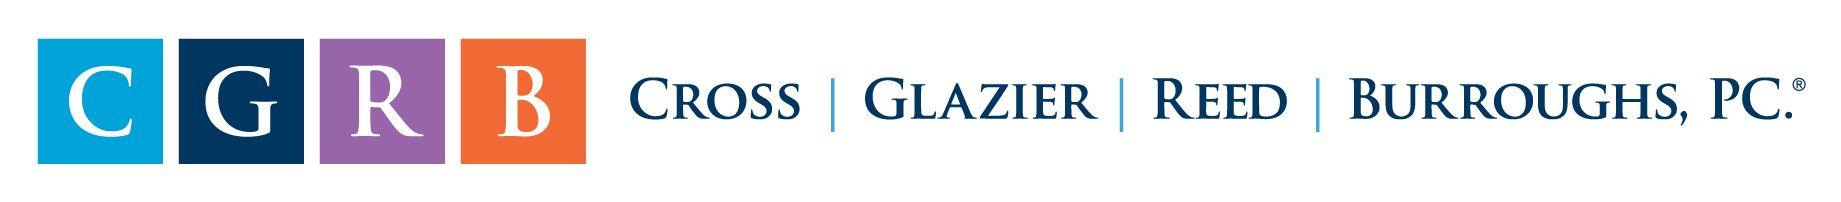 Cross Glazier Reed Burroughs, PC law firm logo